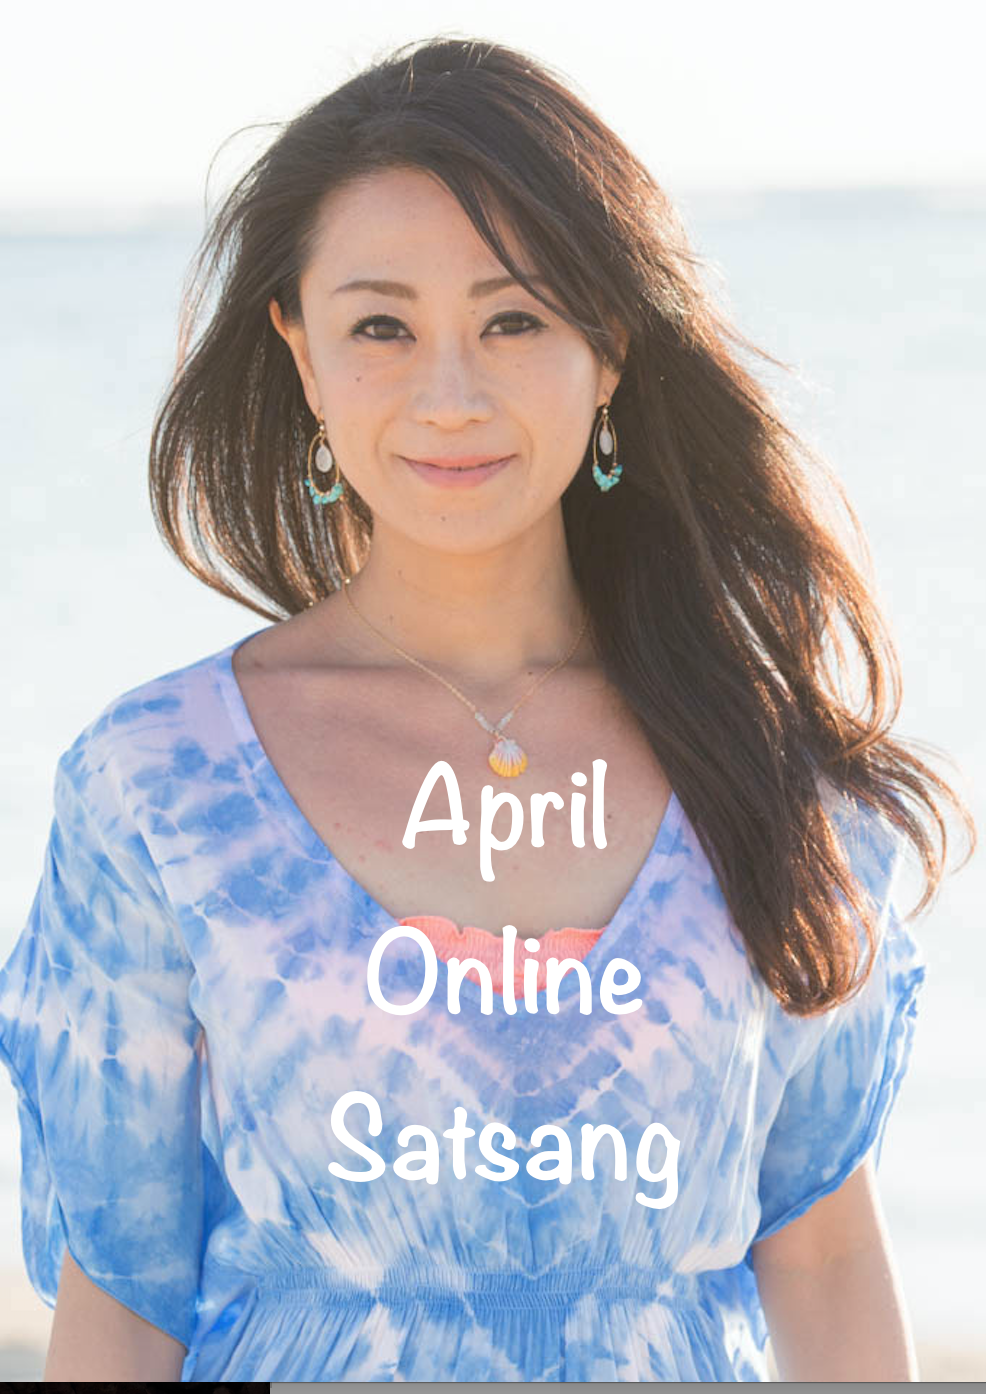 affiche april online satsang